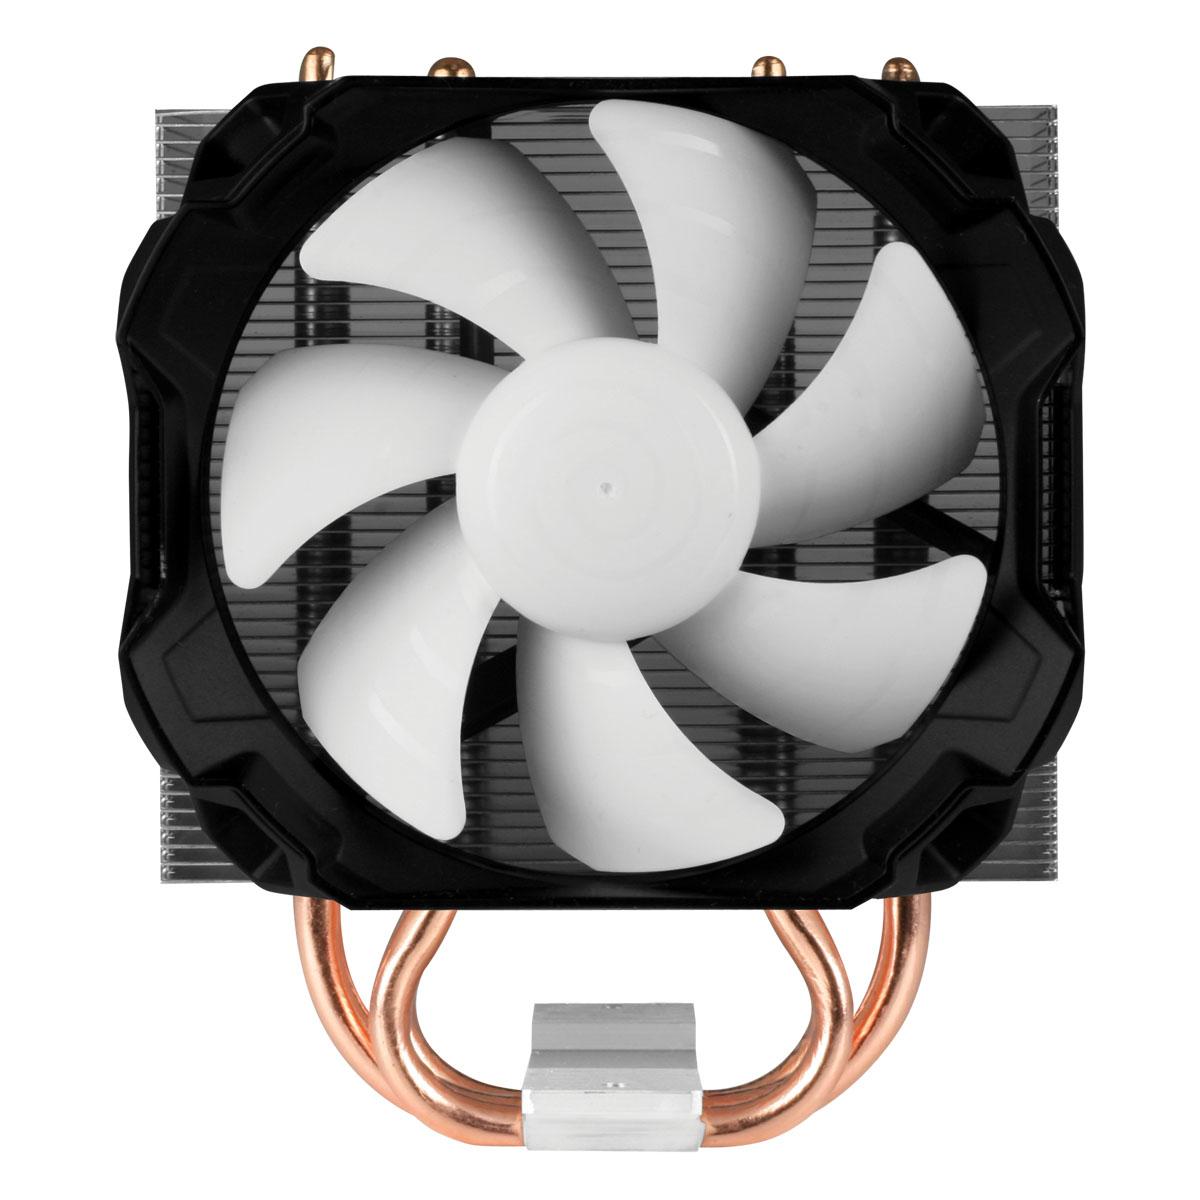 Arctic Freezer A11 Kompakter hochleistungsfähiger CPU-Kühler